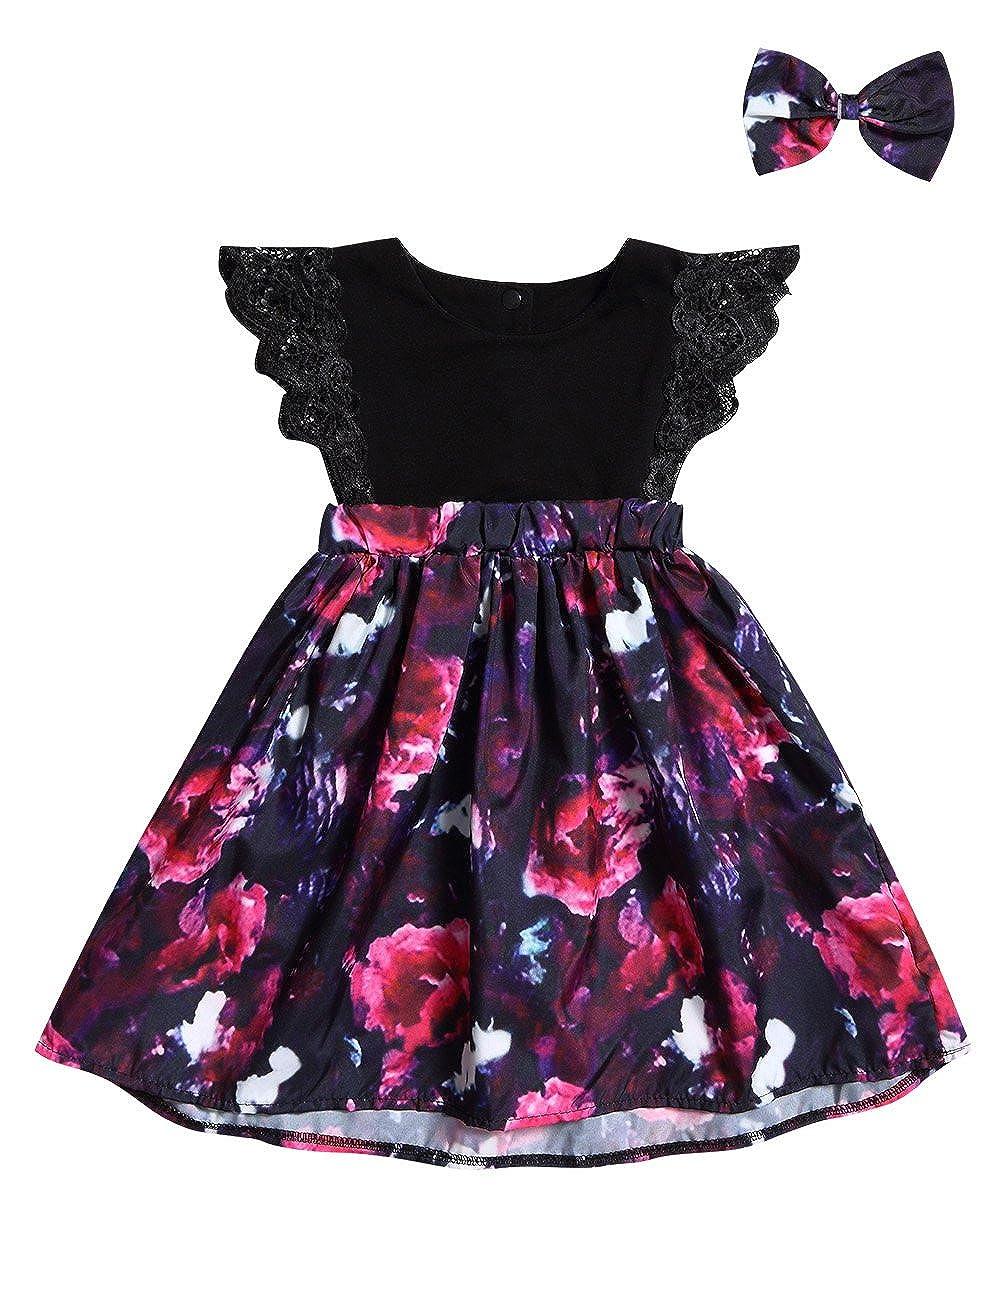 31e2cbd9dc7a0 Newborn Infant Little Girls Matching Dress Features hollow out lace crochet  butterfly flutter short sleeves, floral printing ...